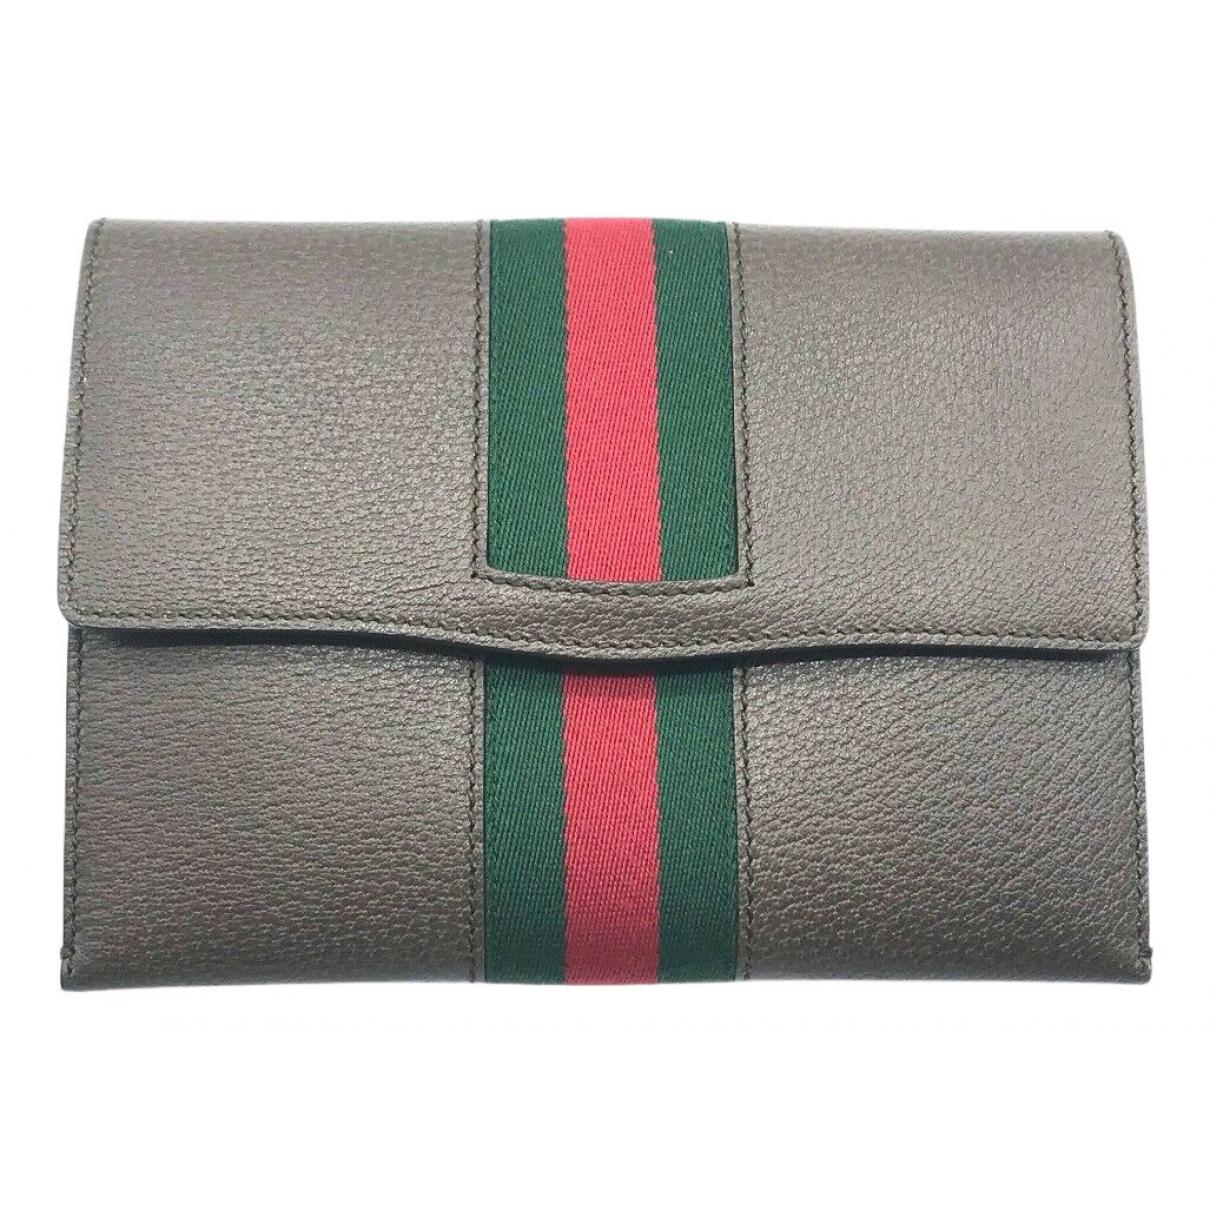 Gucci \N Clutch in  Grau Leder